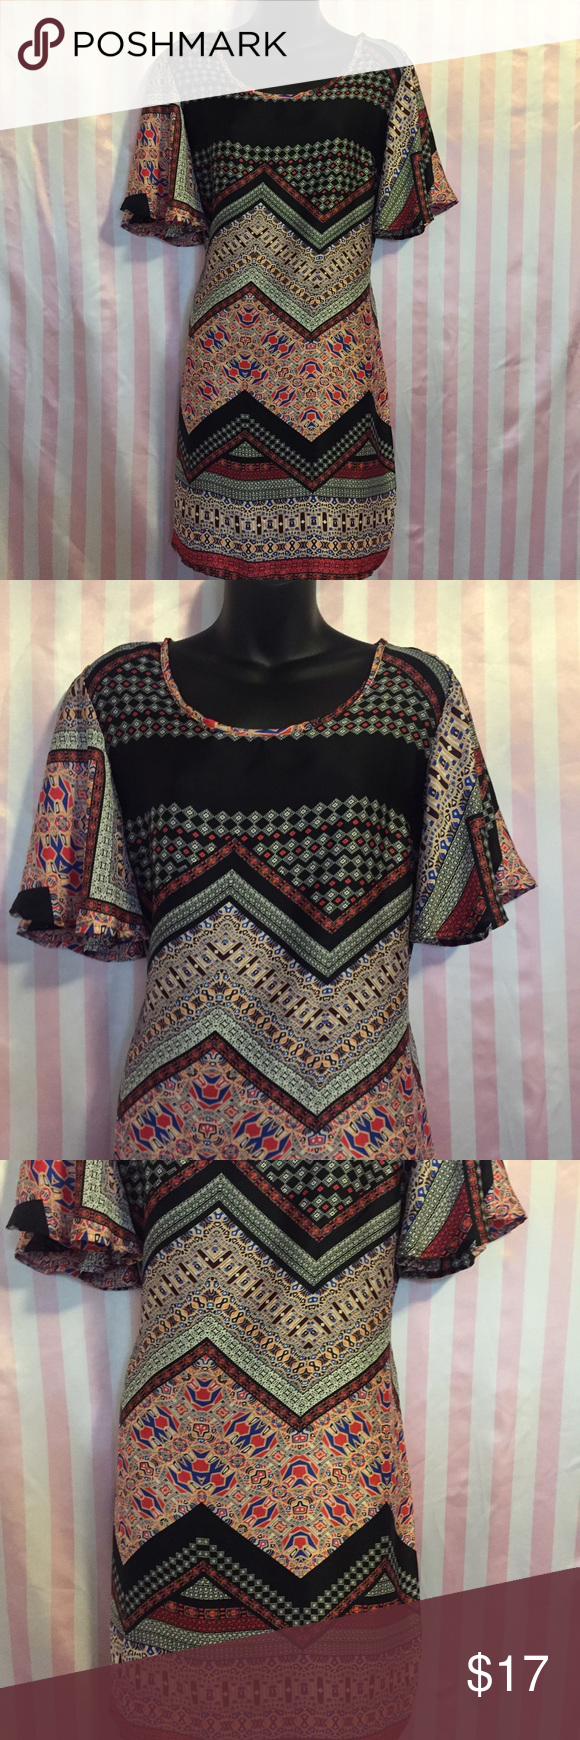 New medium  tunic dress Satin Moroccan inspired Tunic/dress Loose fit Summer Dresses